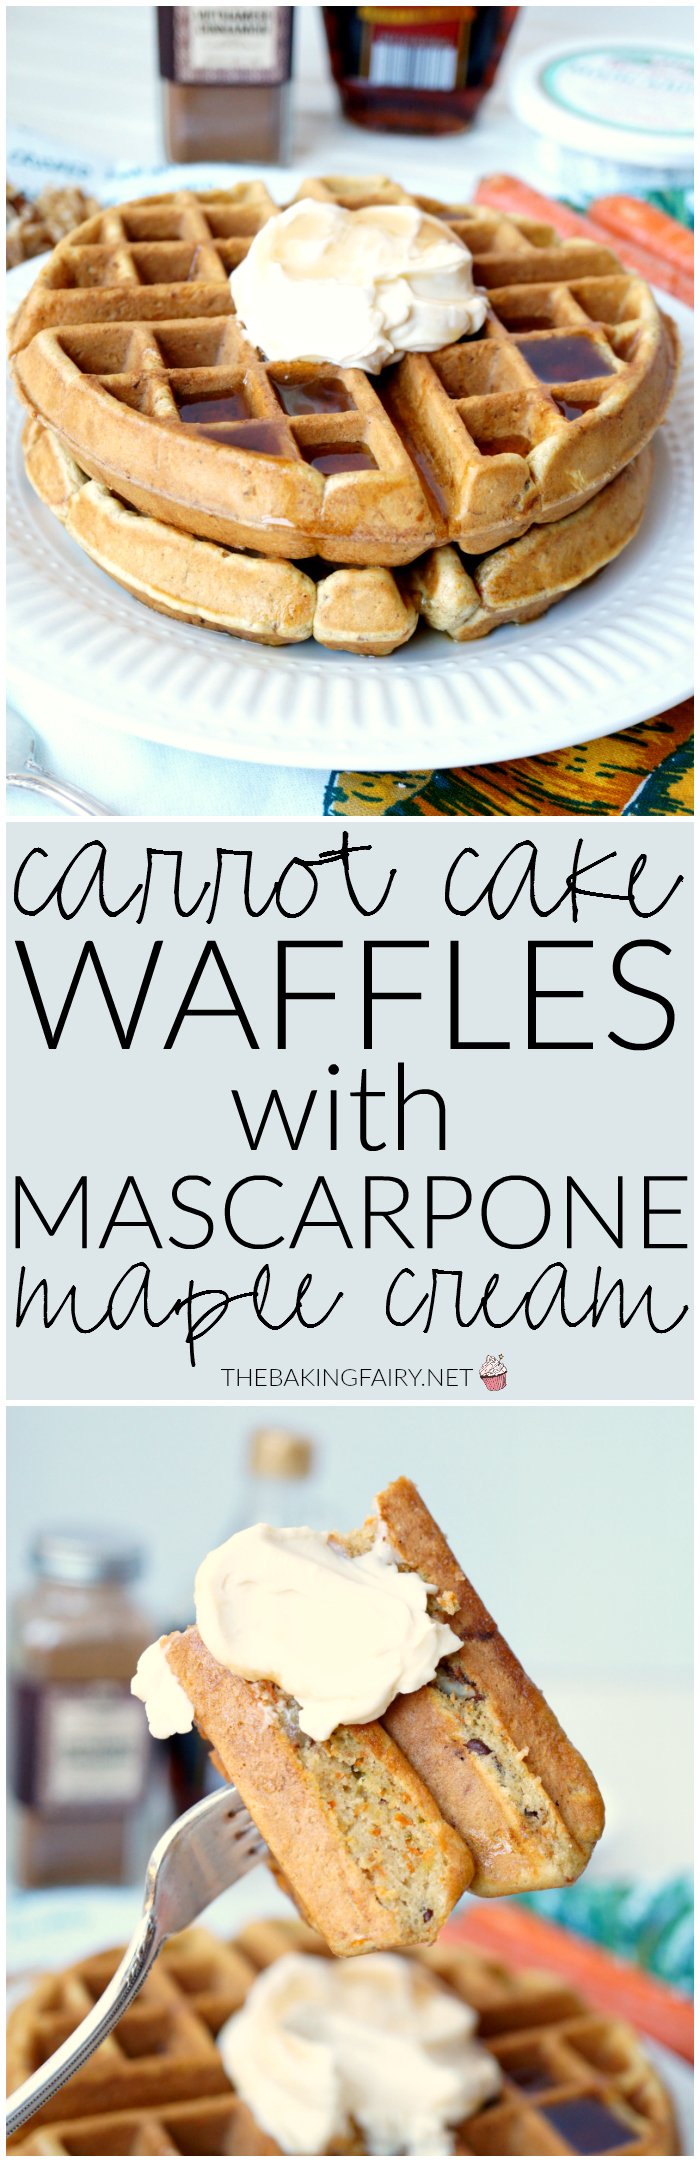 carrot cake waffles with mascarpone maple cream | The Baking Fairy